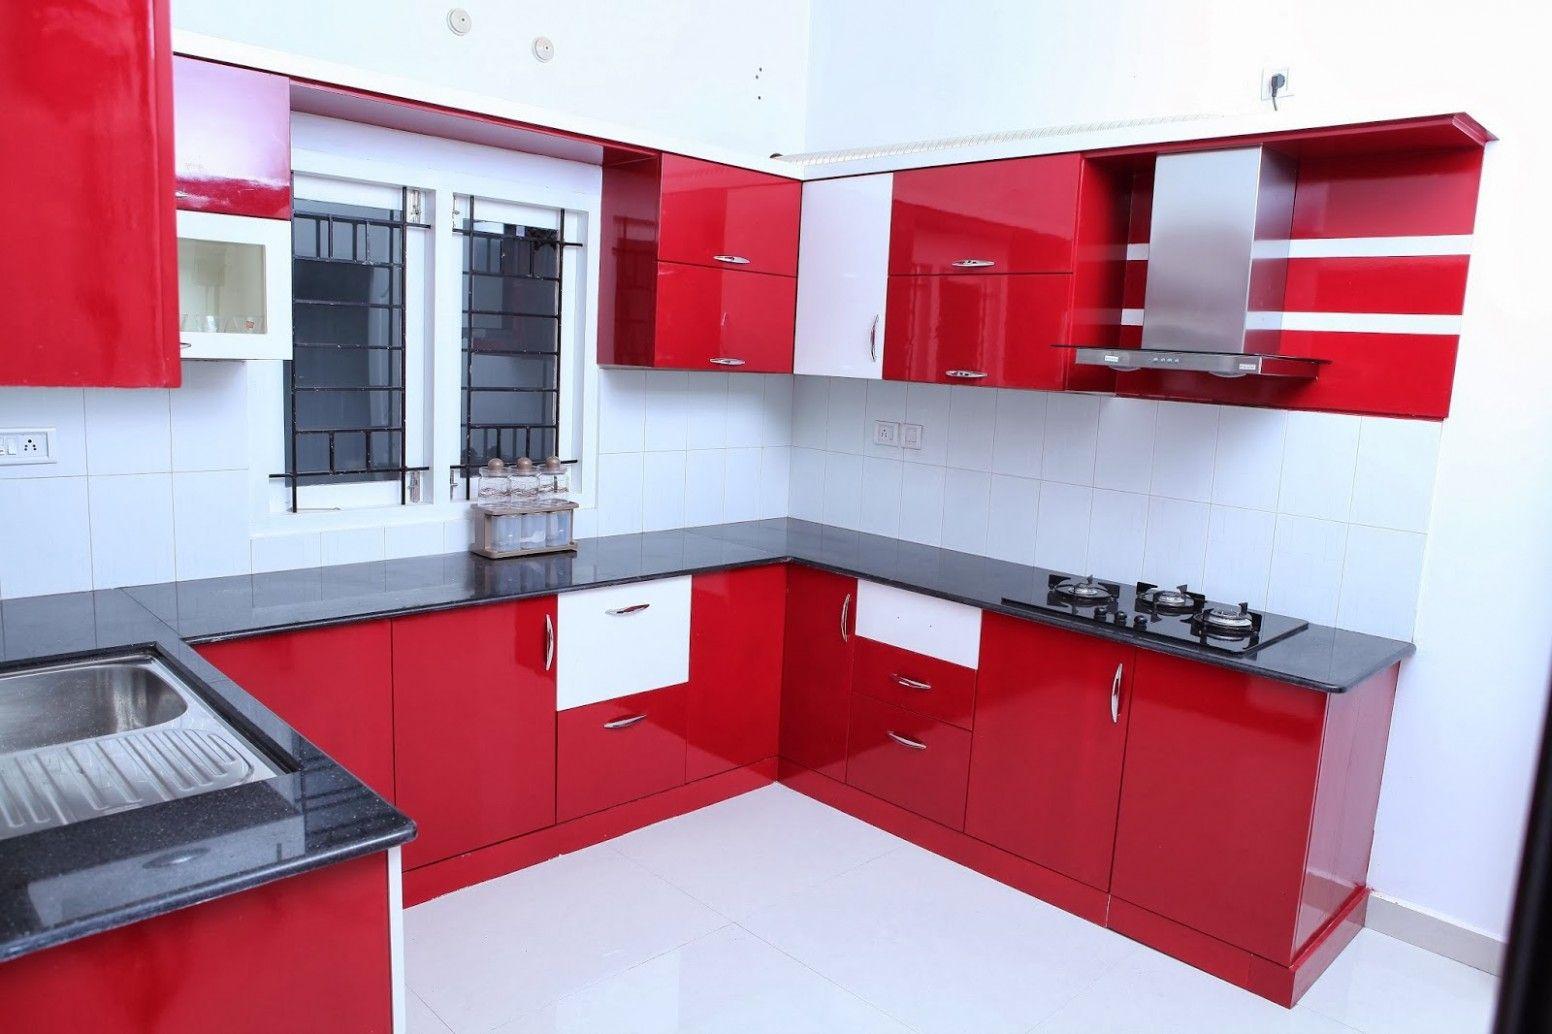 Mdf Kitchen Cabinets Kerala Kitchen Cabinets Prices Kitchen Cabinets Aluminum Kitchen Cabinets